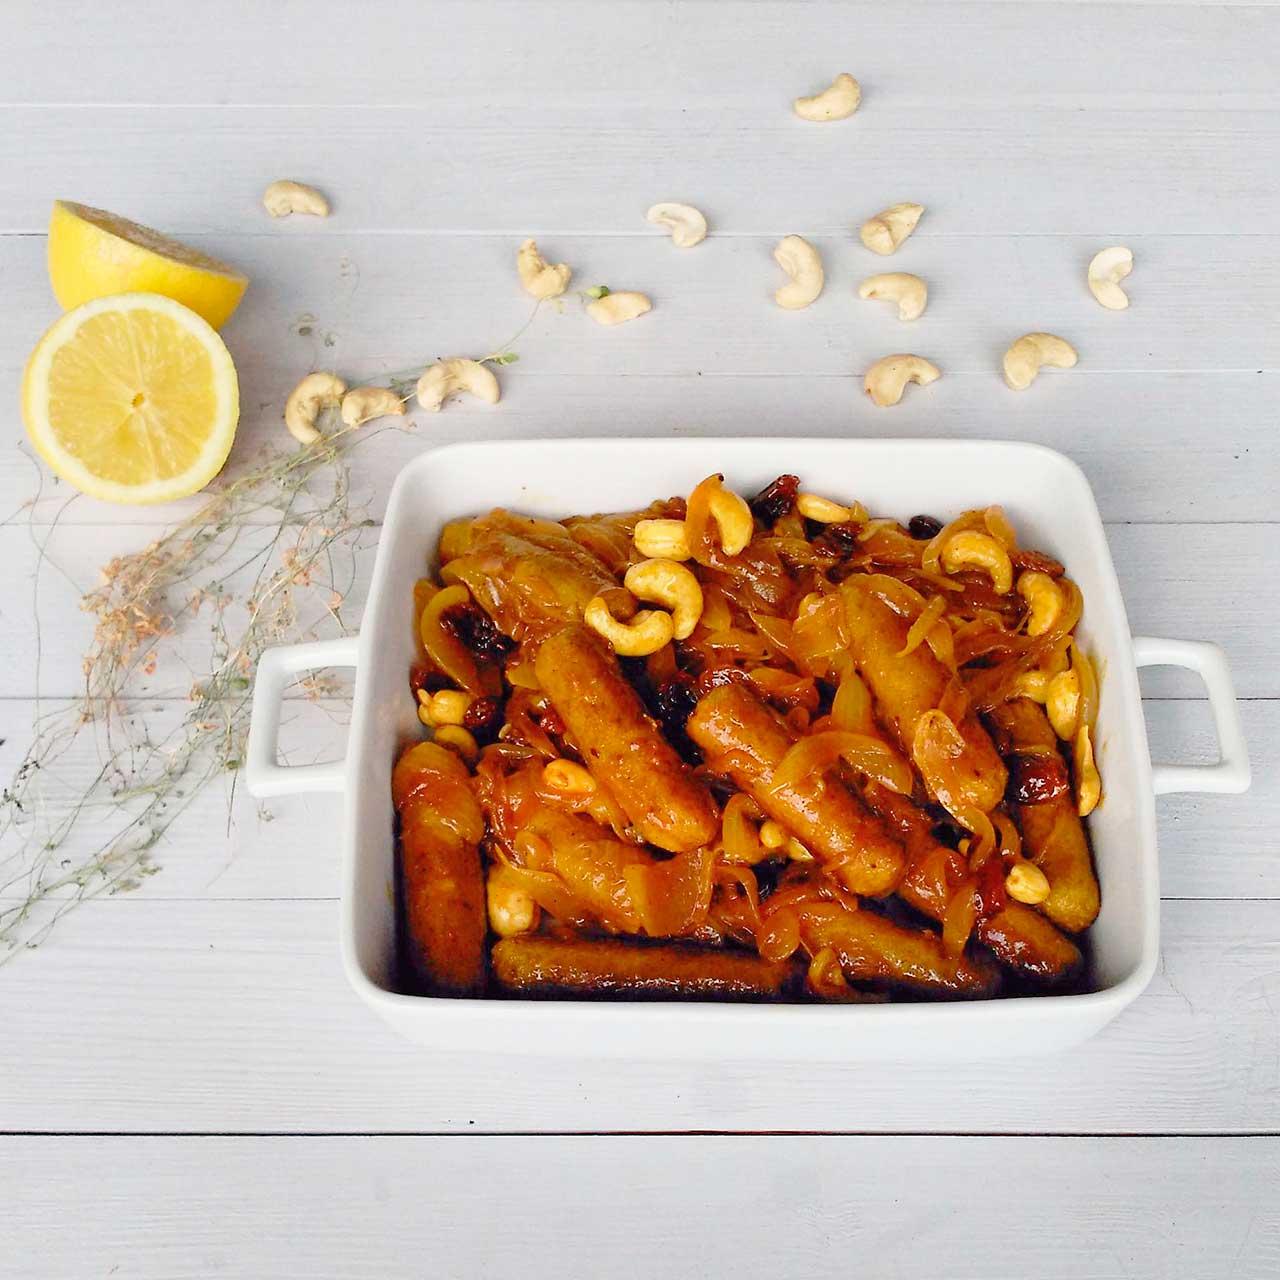 Mini salchichas de trigo sarraceno al curry con cebolla caramelizada